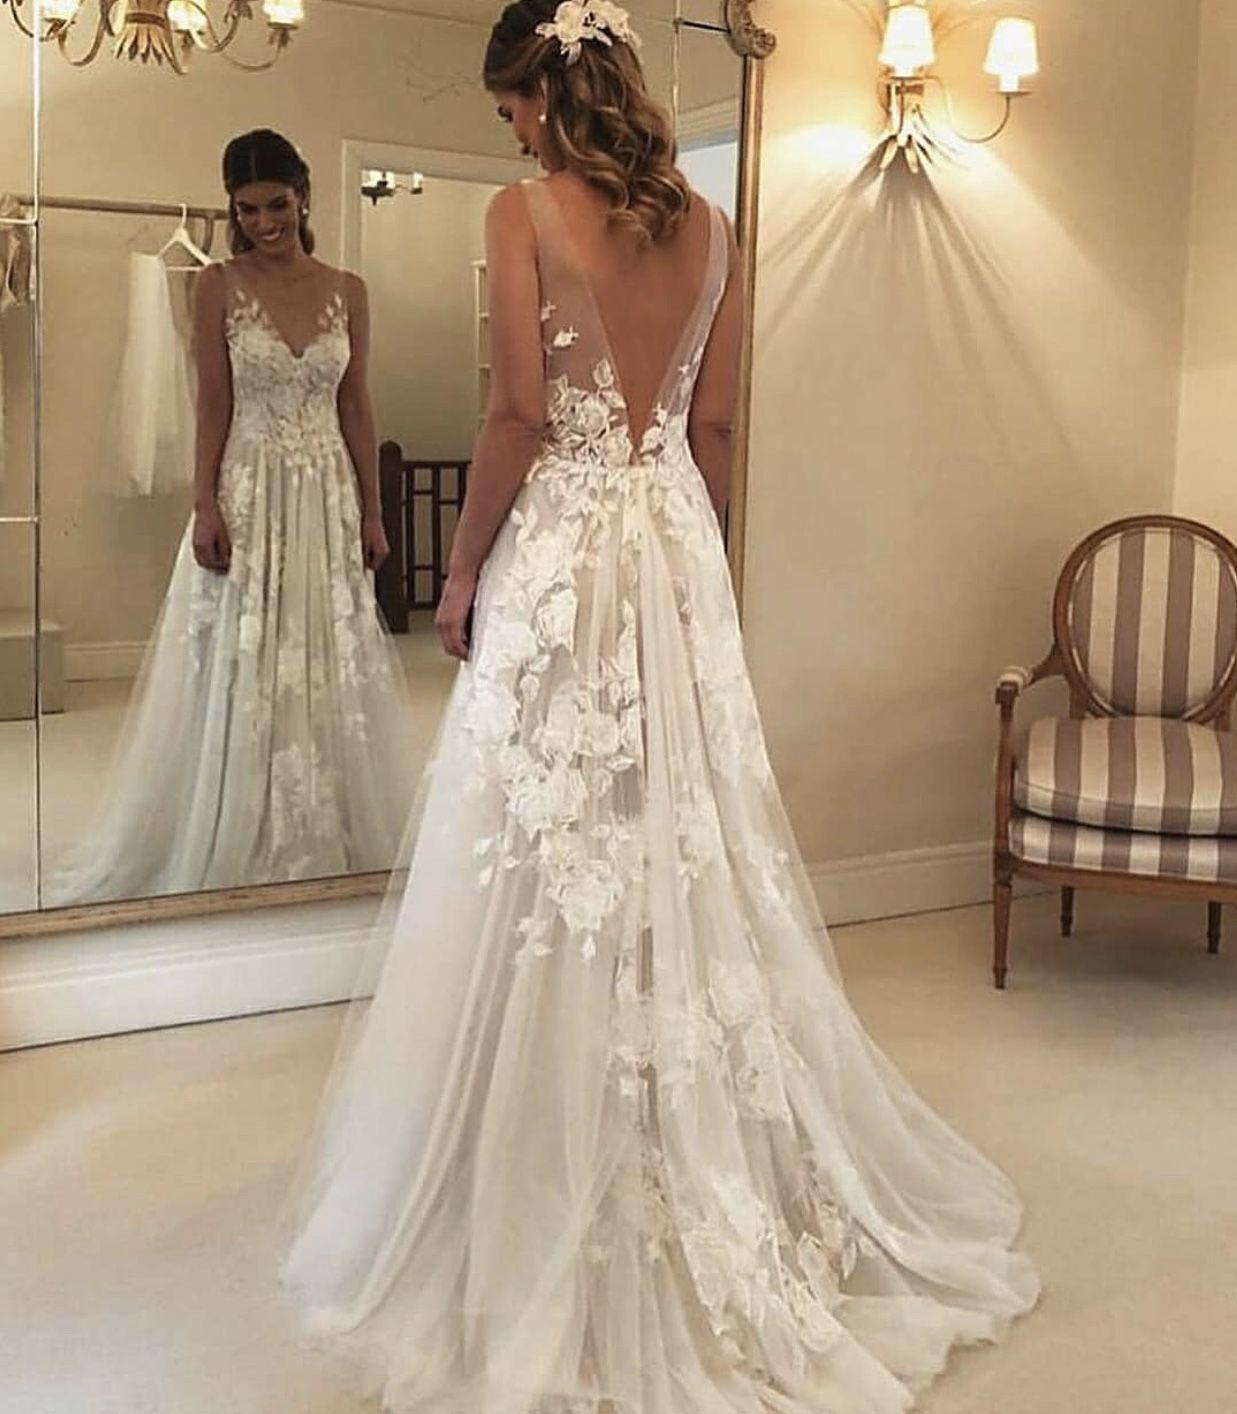 Pin By Katie Solzsmon On Wedding Wedding Dresses Wedding Dresses Lace Tulle Wedding